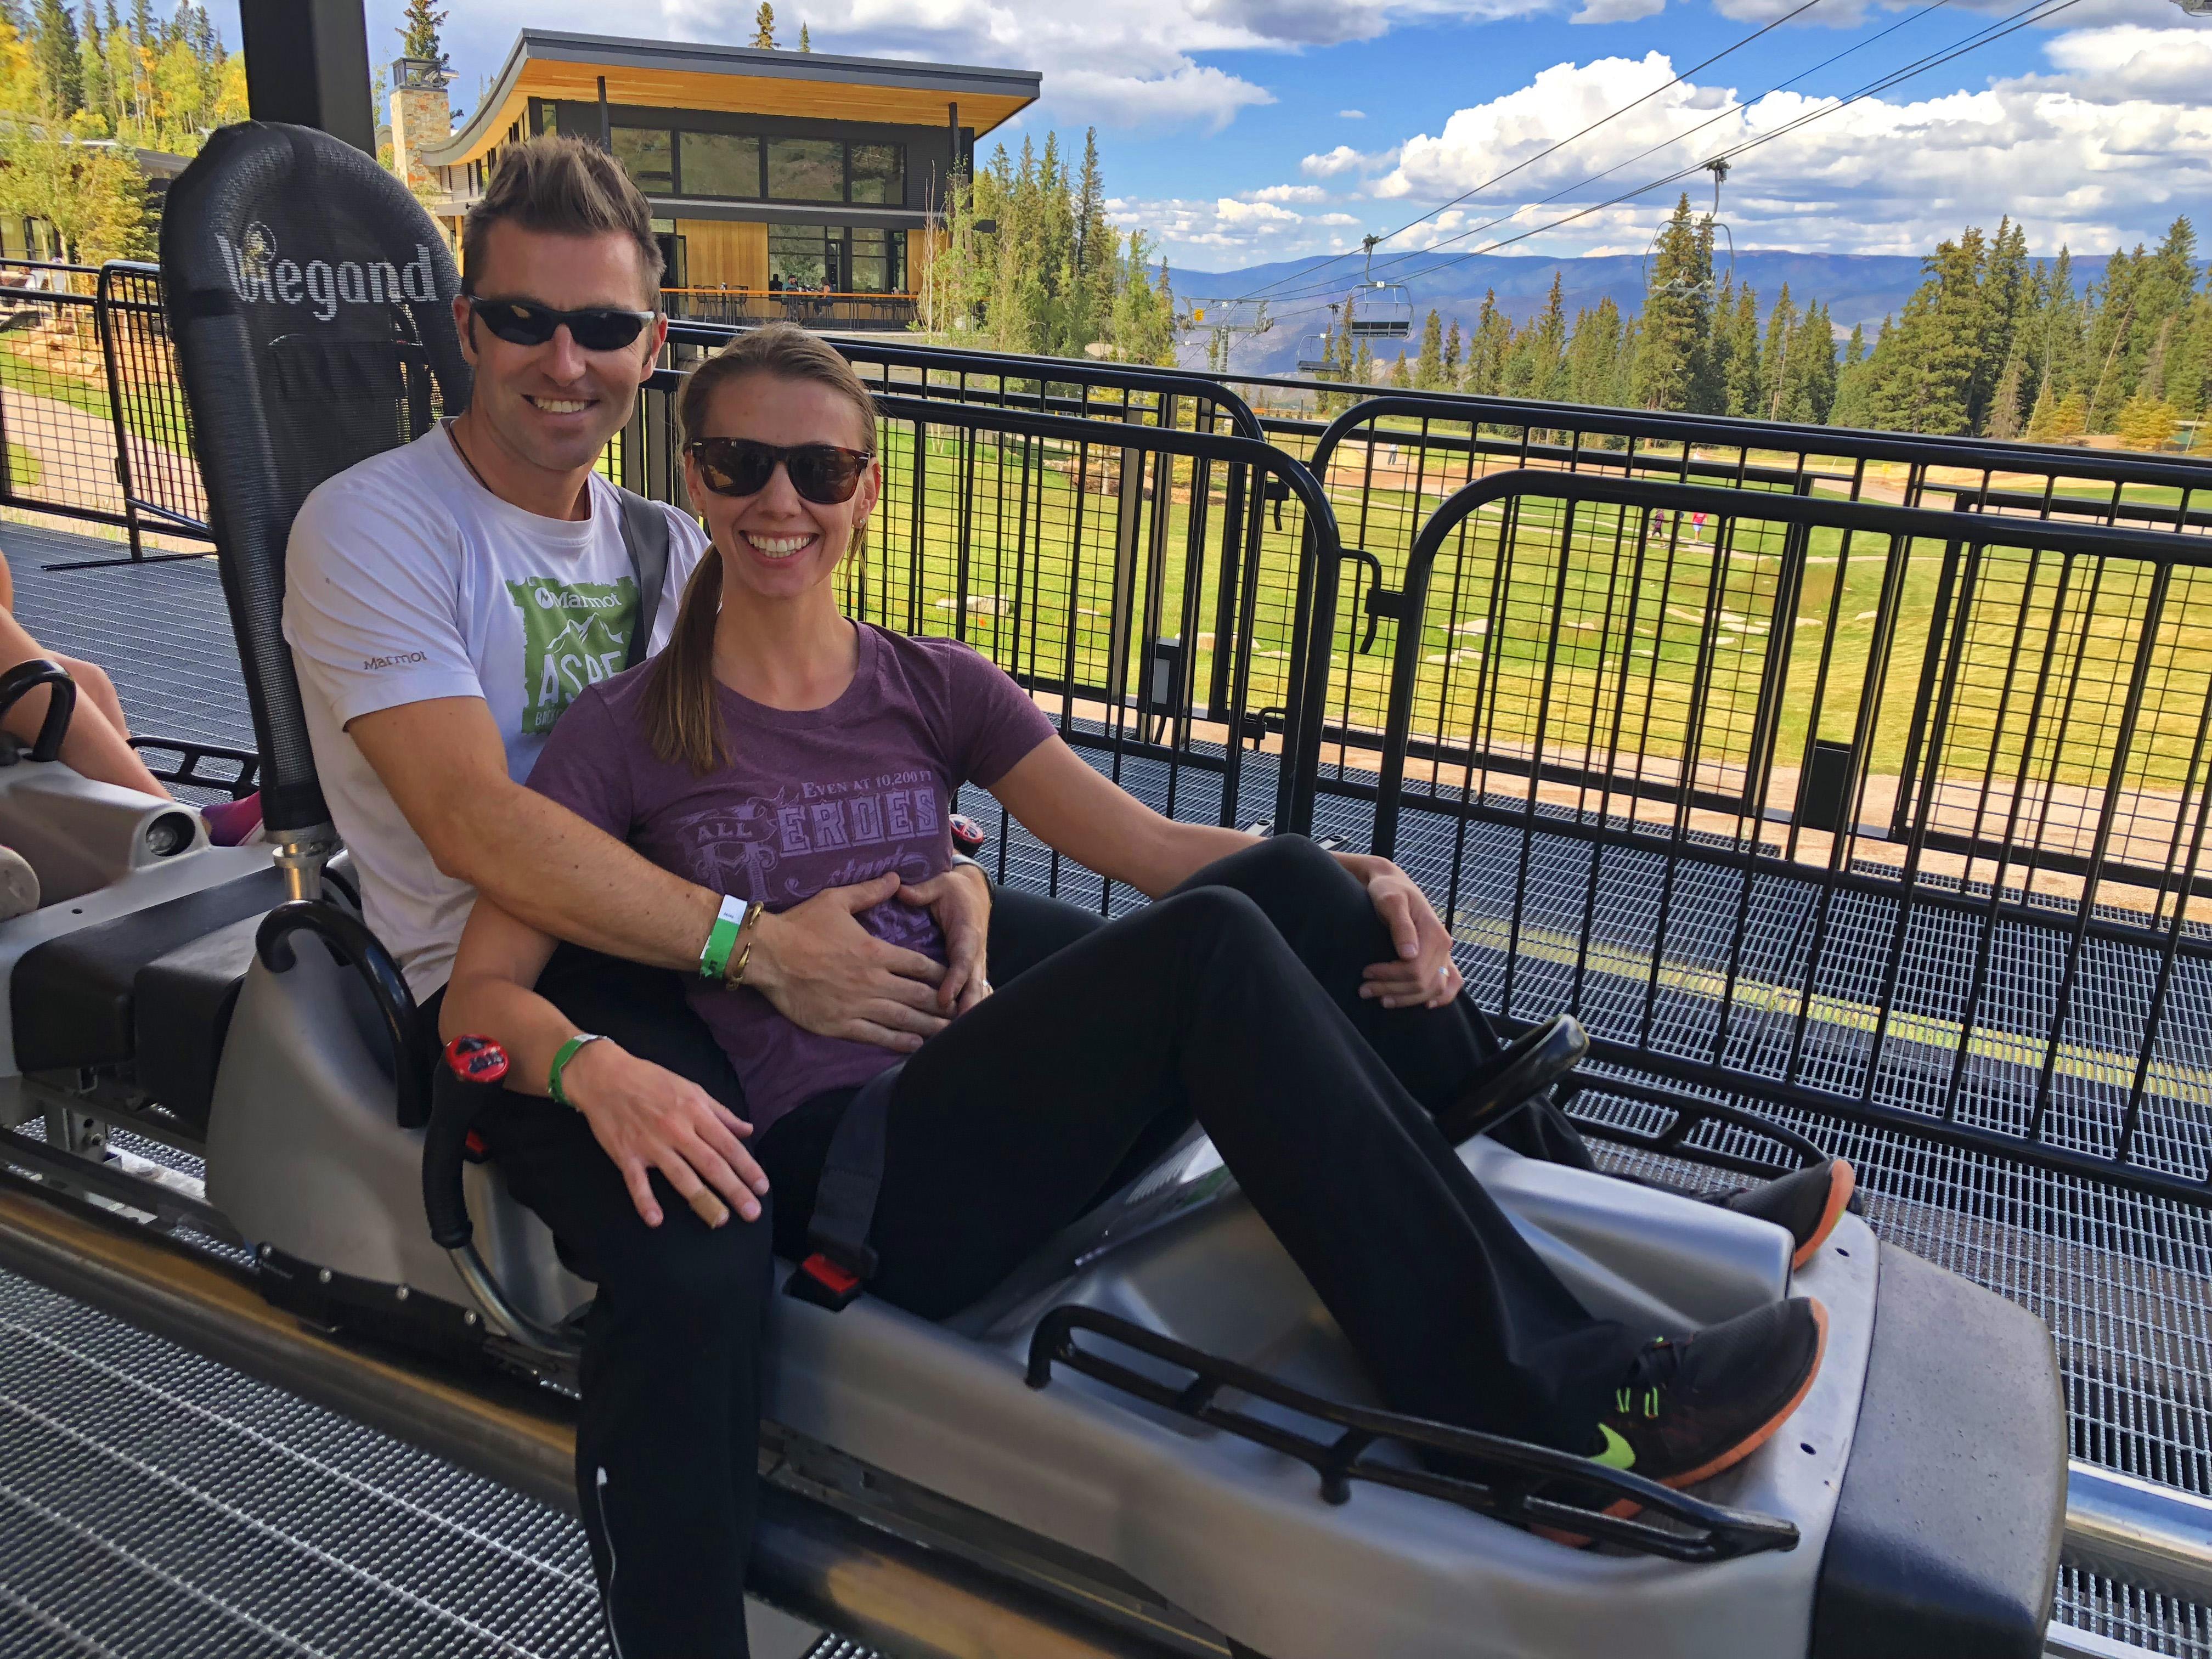 Couple on Alpine Roller Coaster in Snowmass Colorado